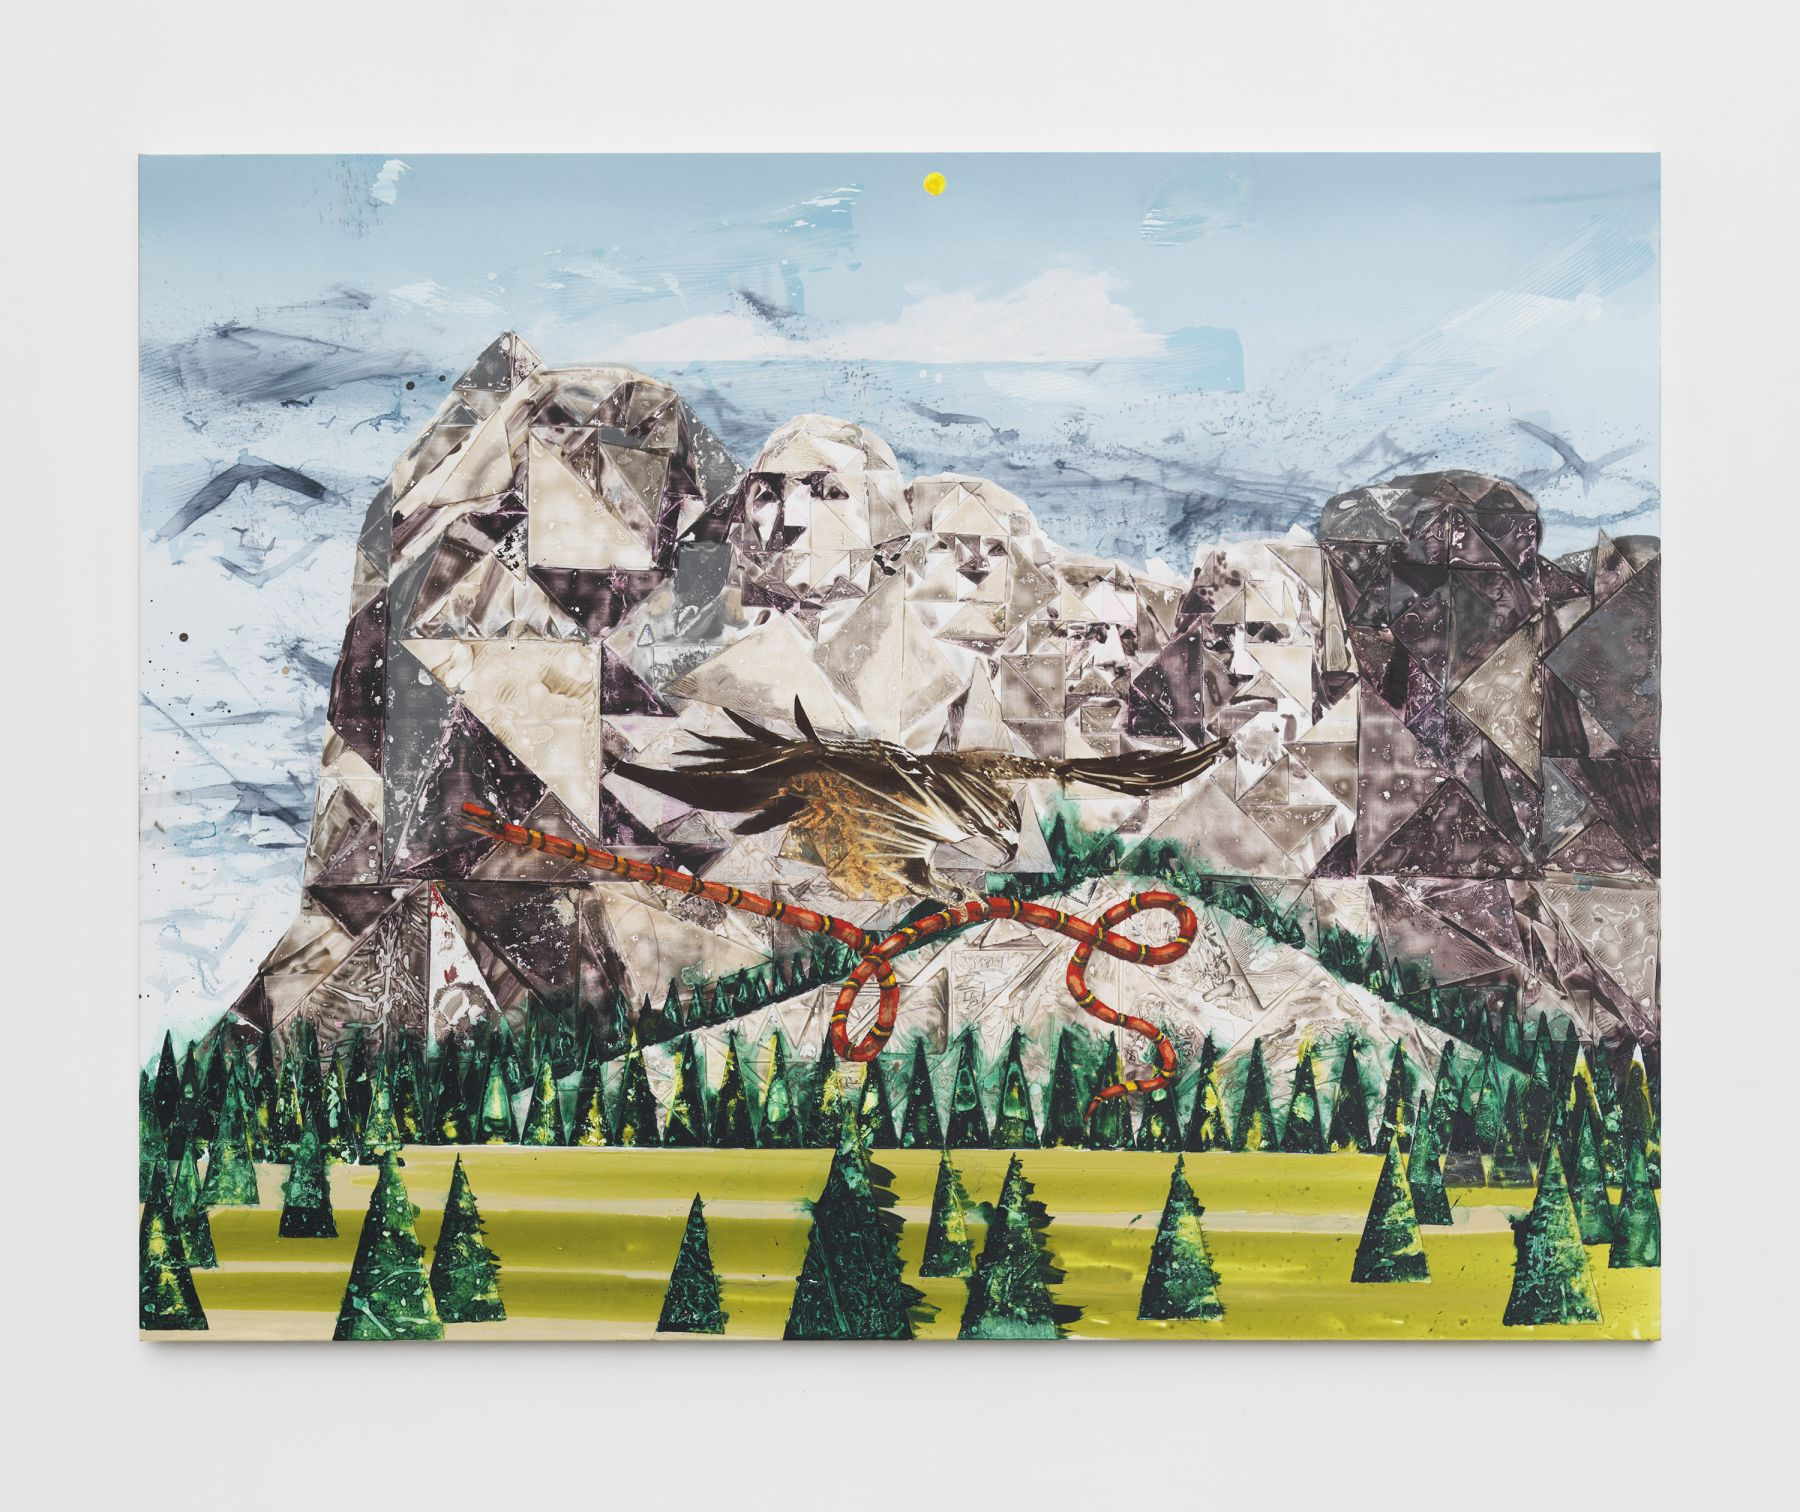 Mt. Rushmore No. 2, 2018